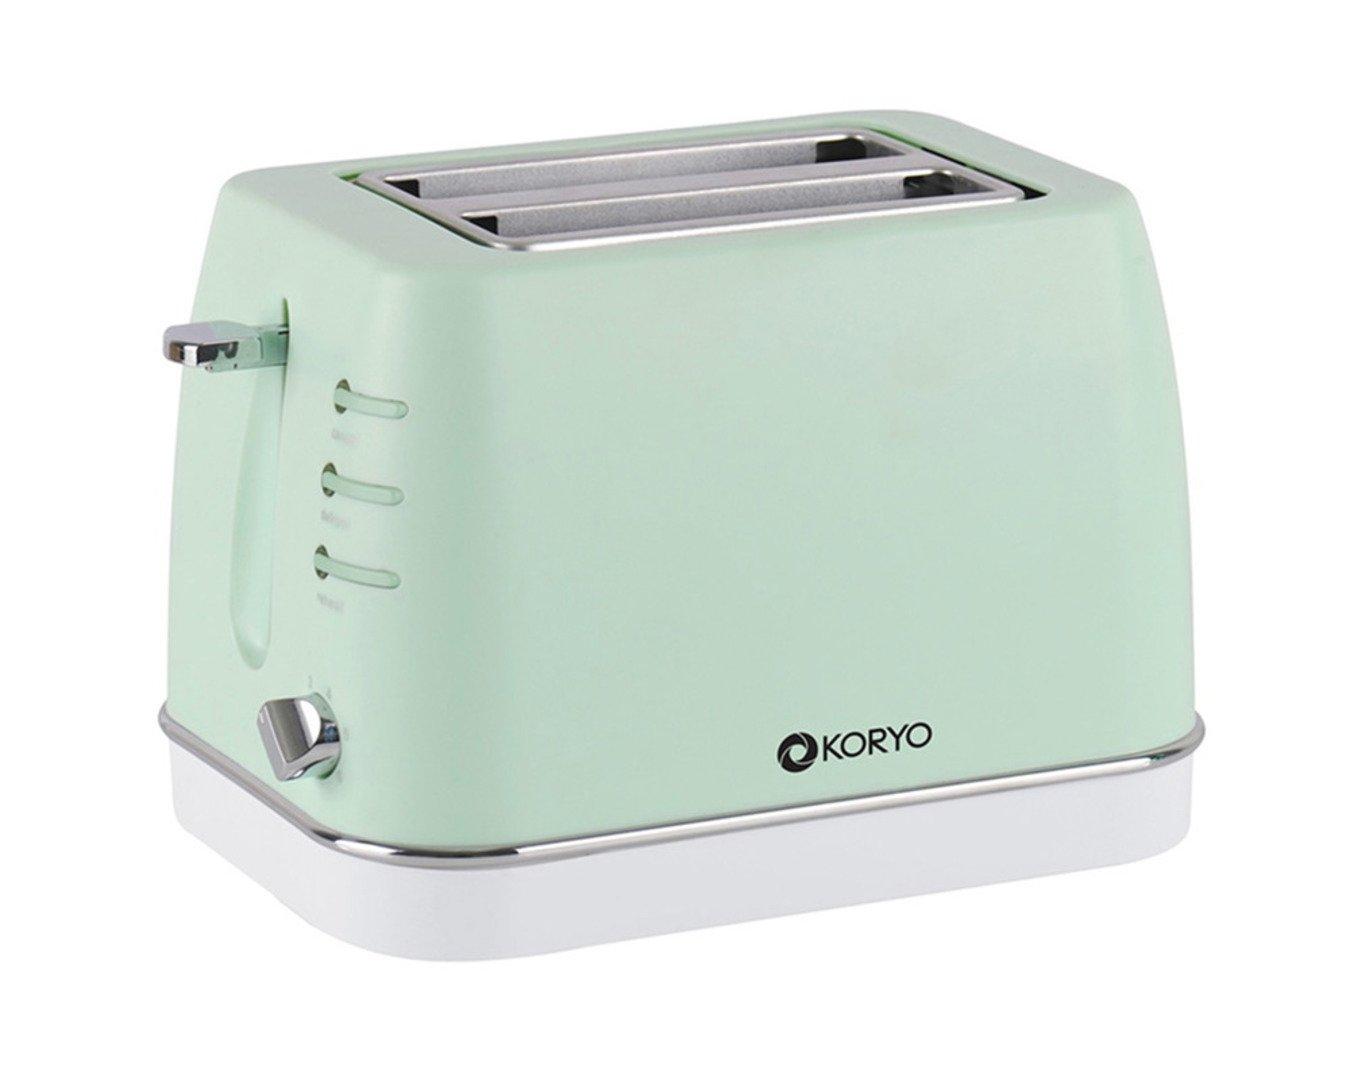 Koryo KPT1368BCG 2 Slice Pop up Toaster